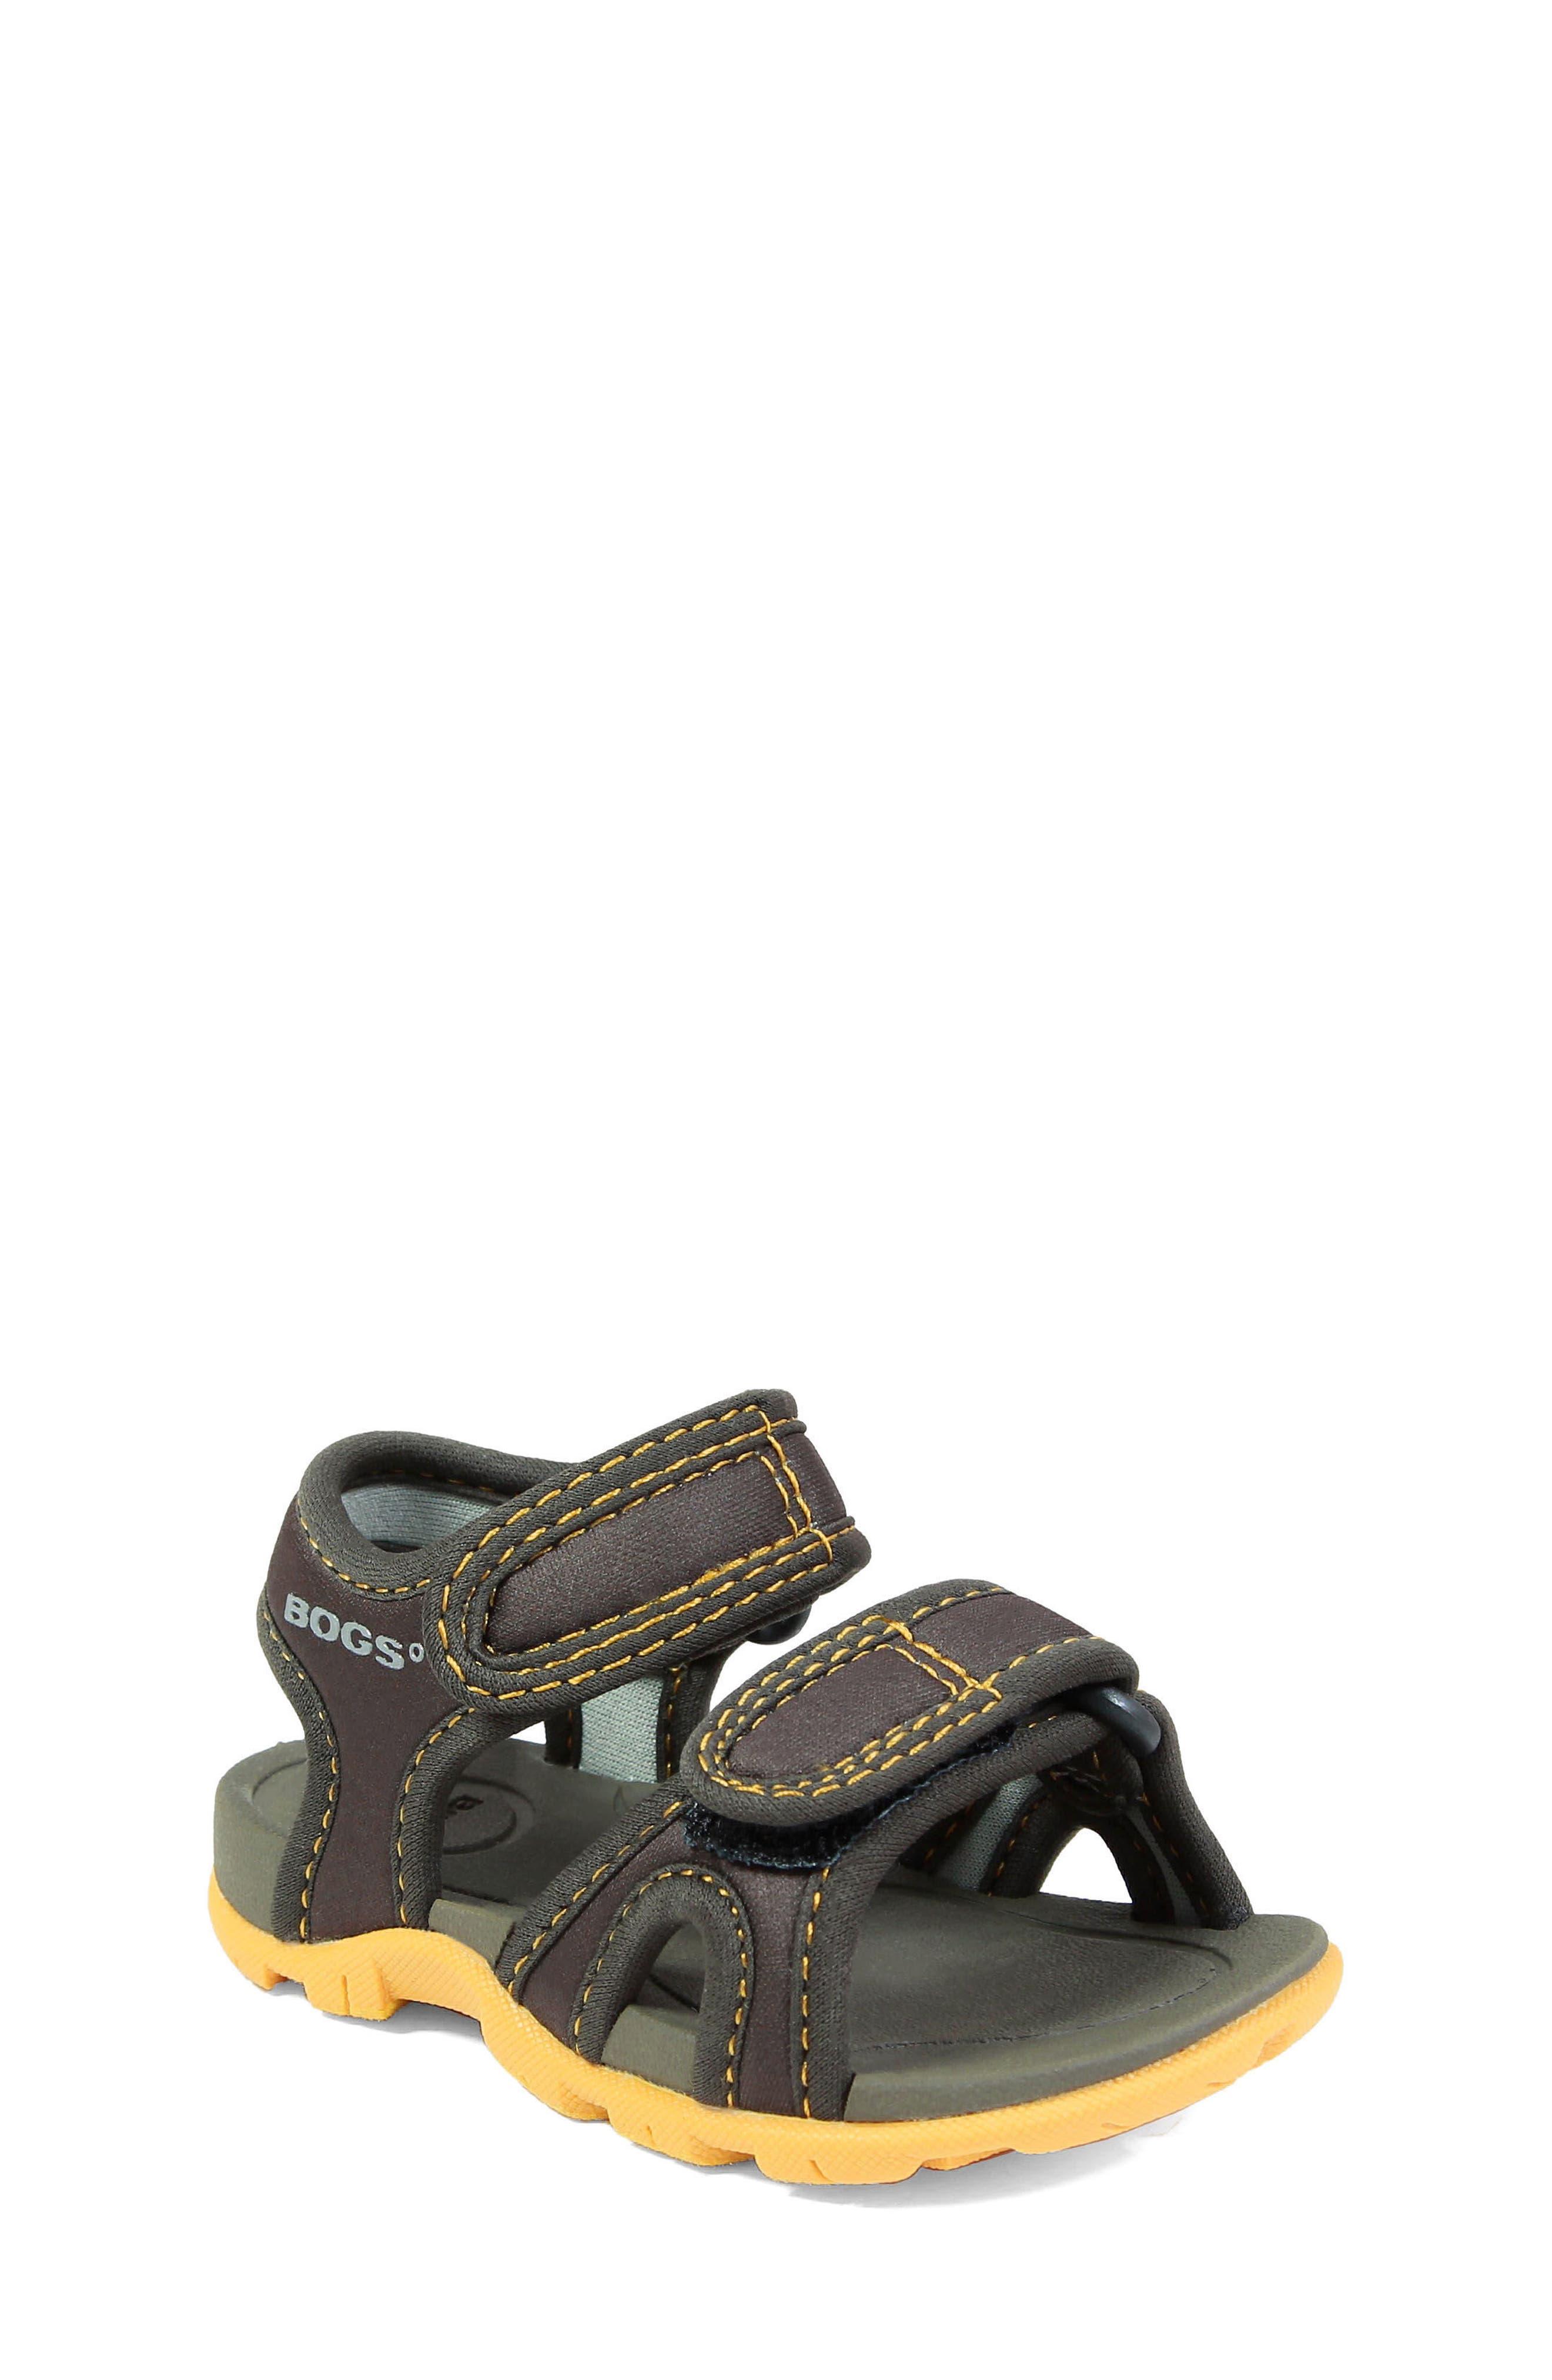 Whitefish Waterproof Sandal,                             Main thumbnail 1, color,                             Olive Multi